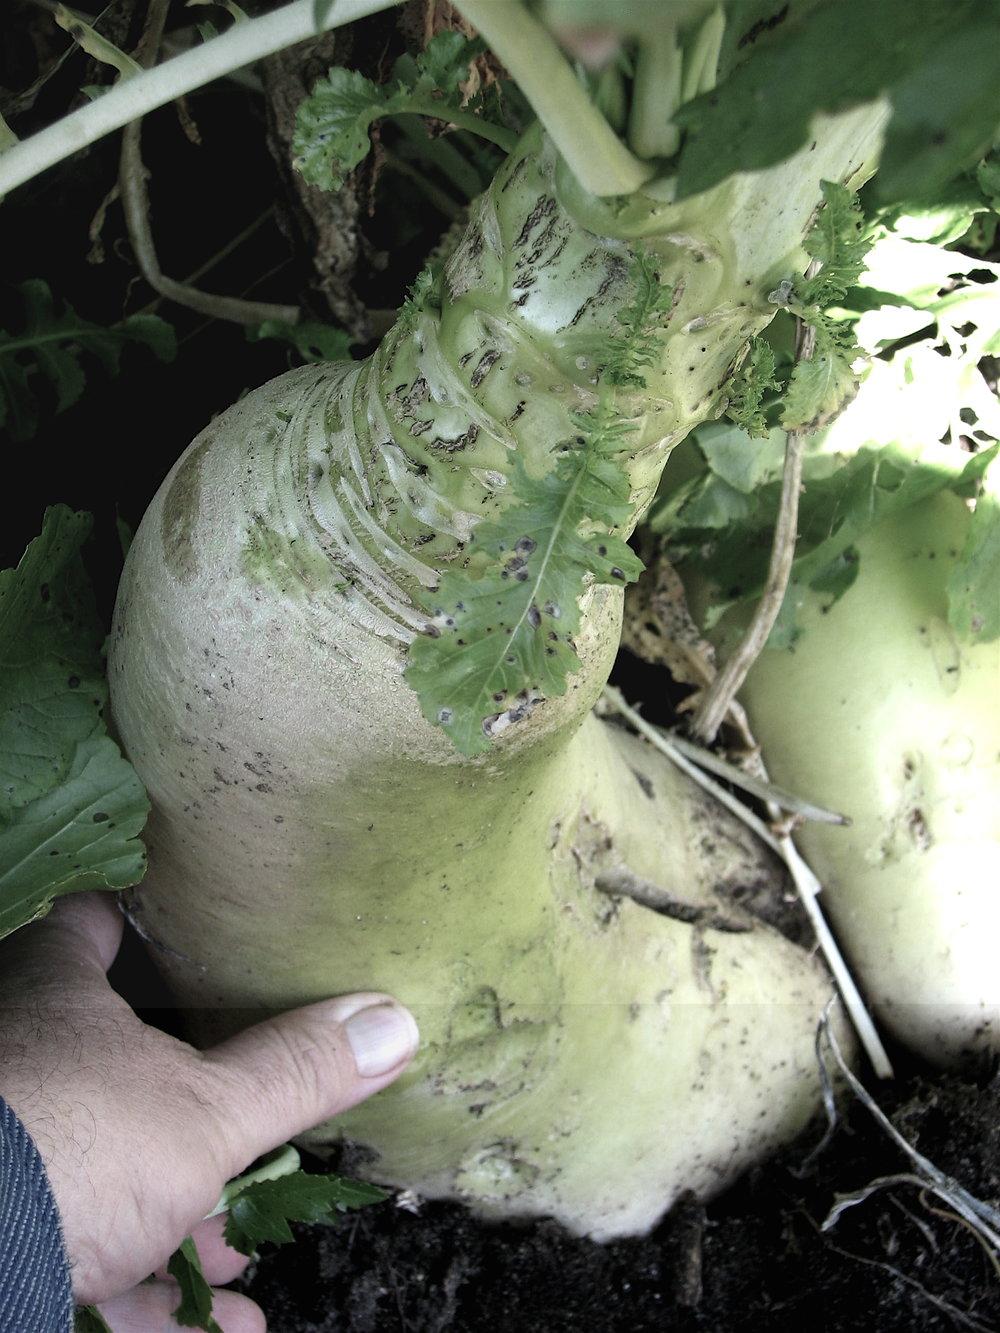 Giant radish roots